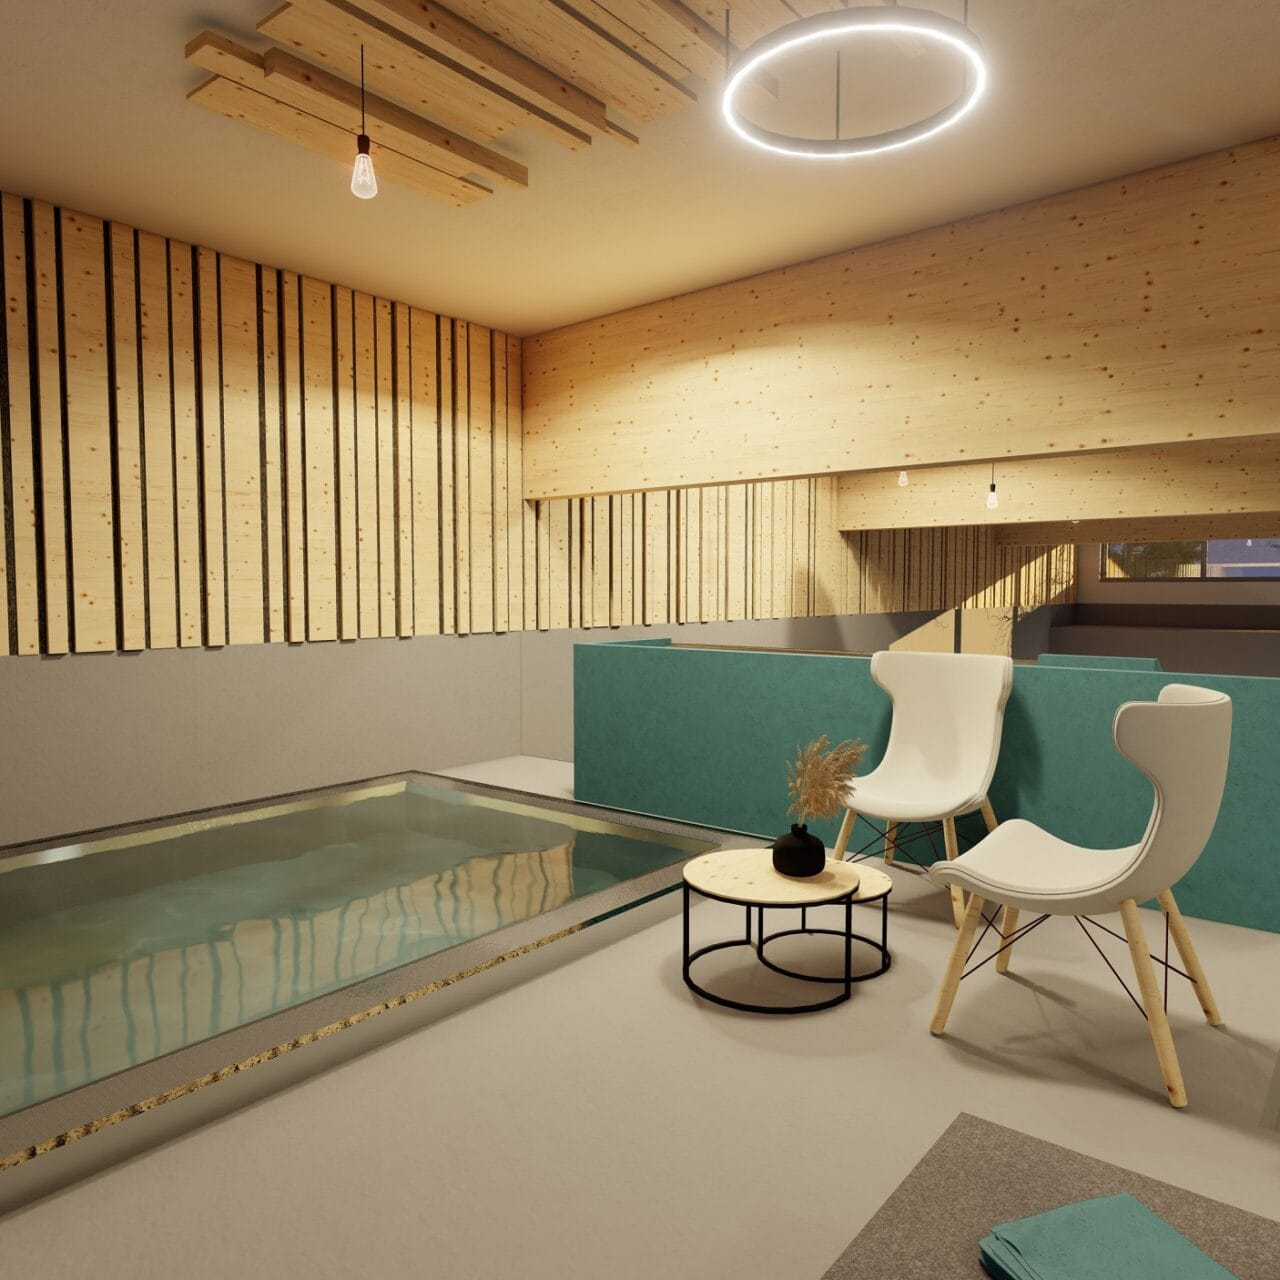 HOFGUT-apartment-lifestyle-resort-wagrain-familien-babybecken.jpg